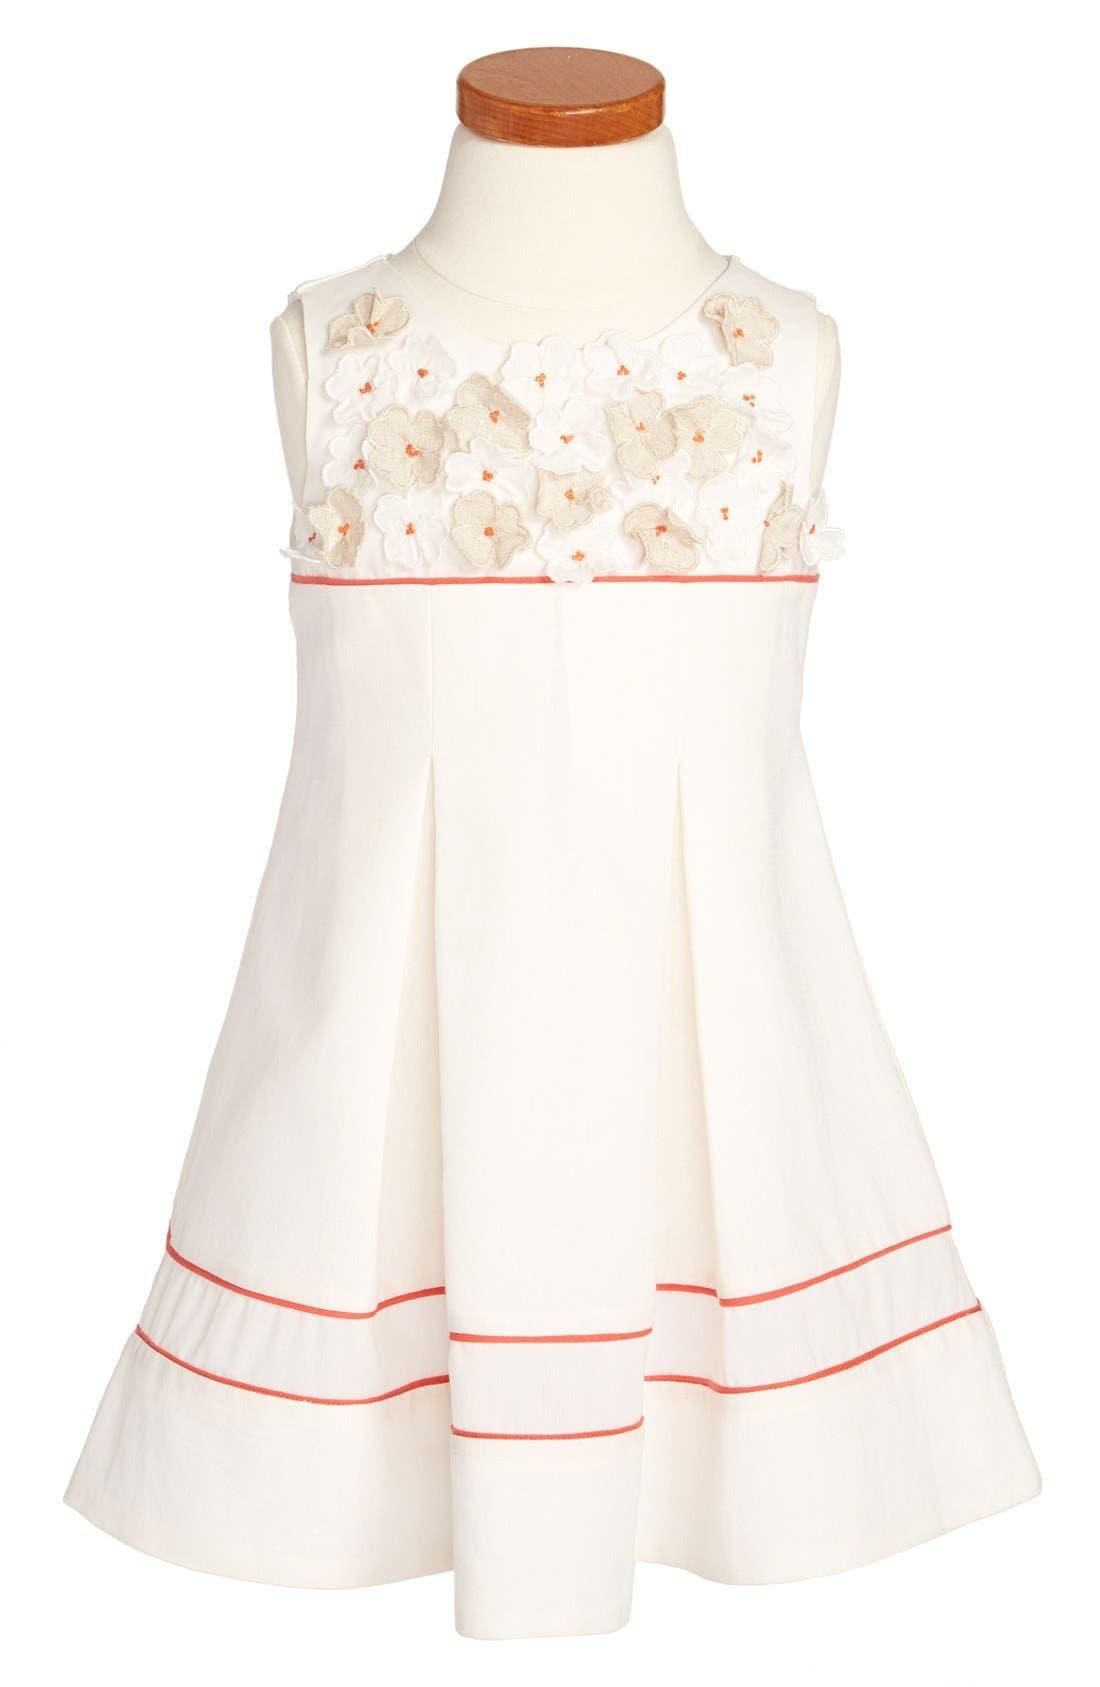 Alternate Image 1 Selected - Luli & Me Sleeveless Dress (Toddler Girls, Little Girls & Big Girls)